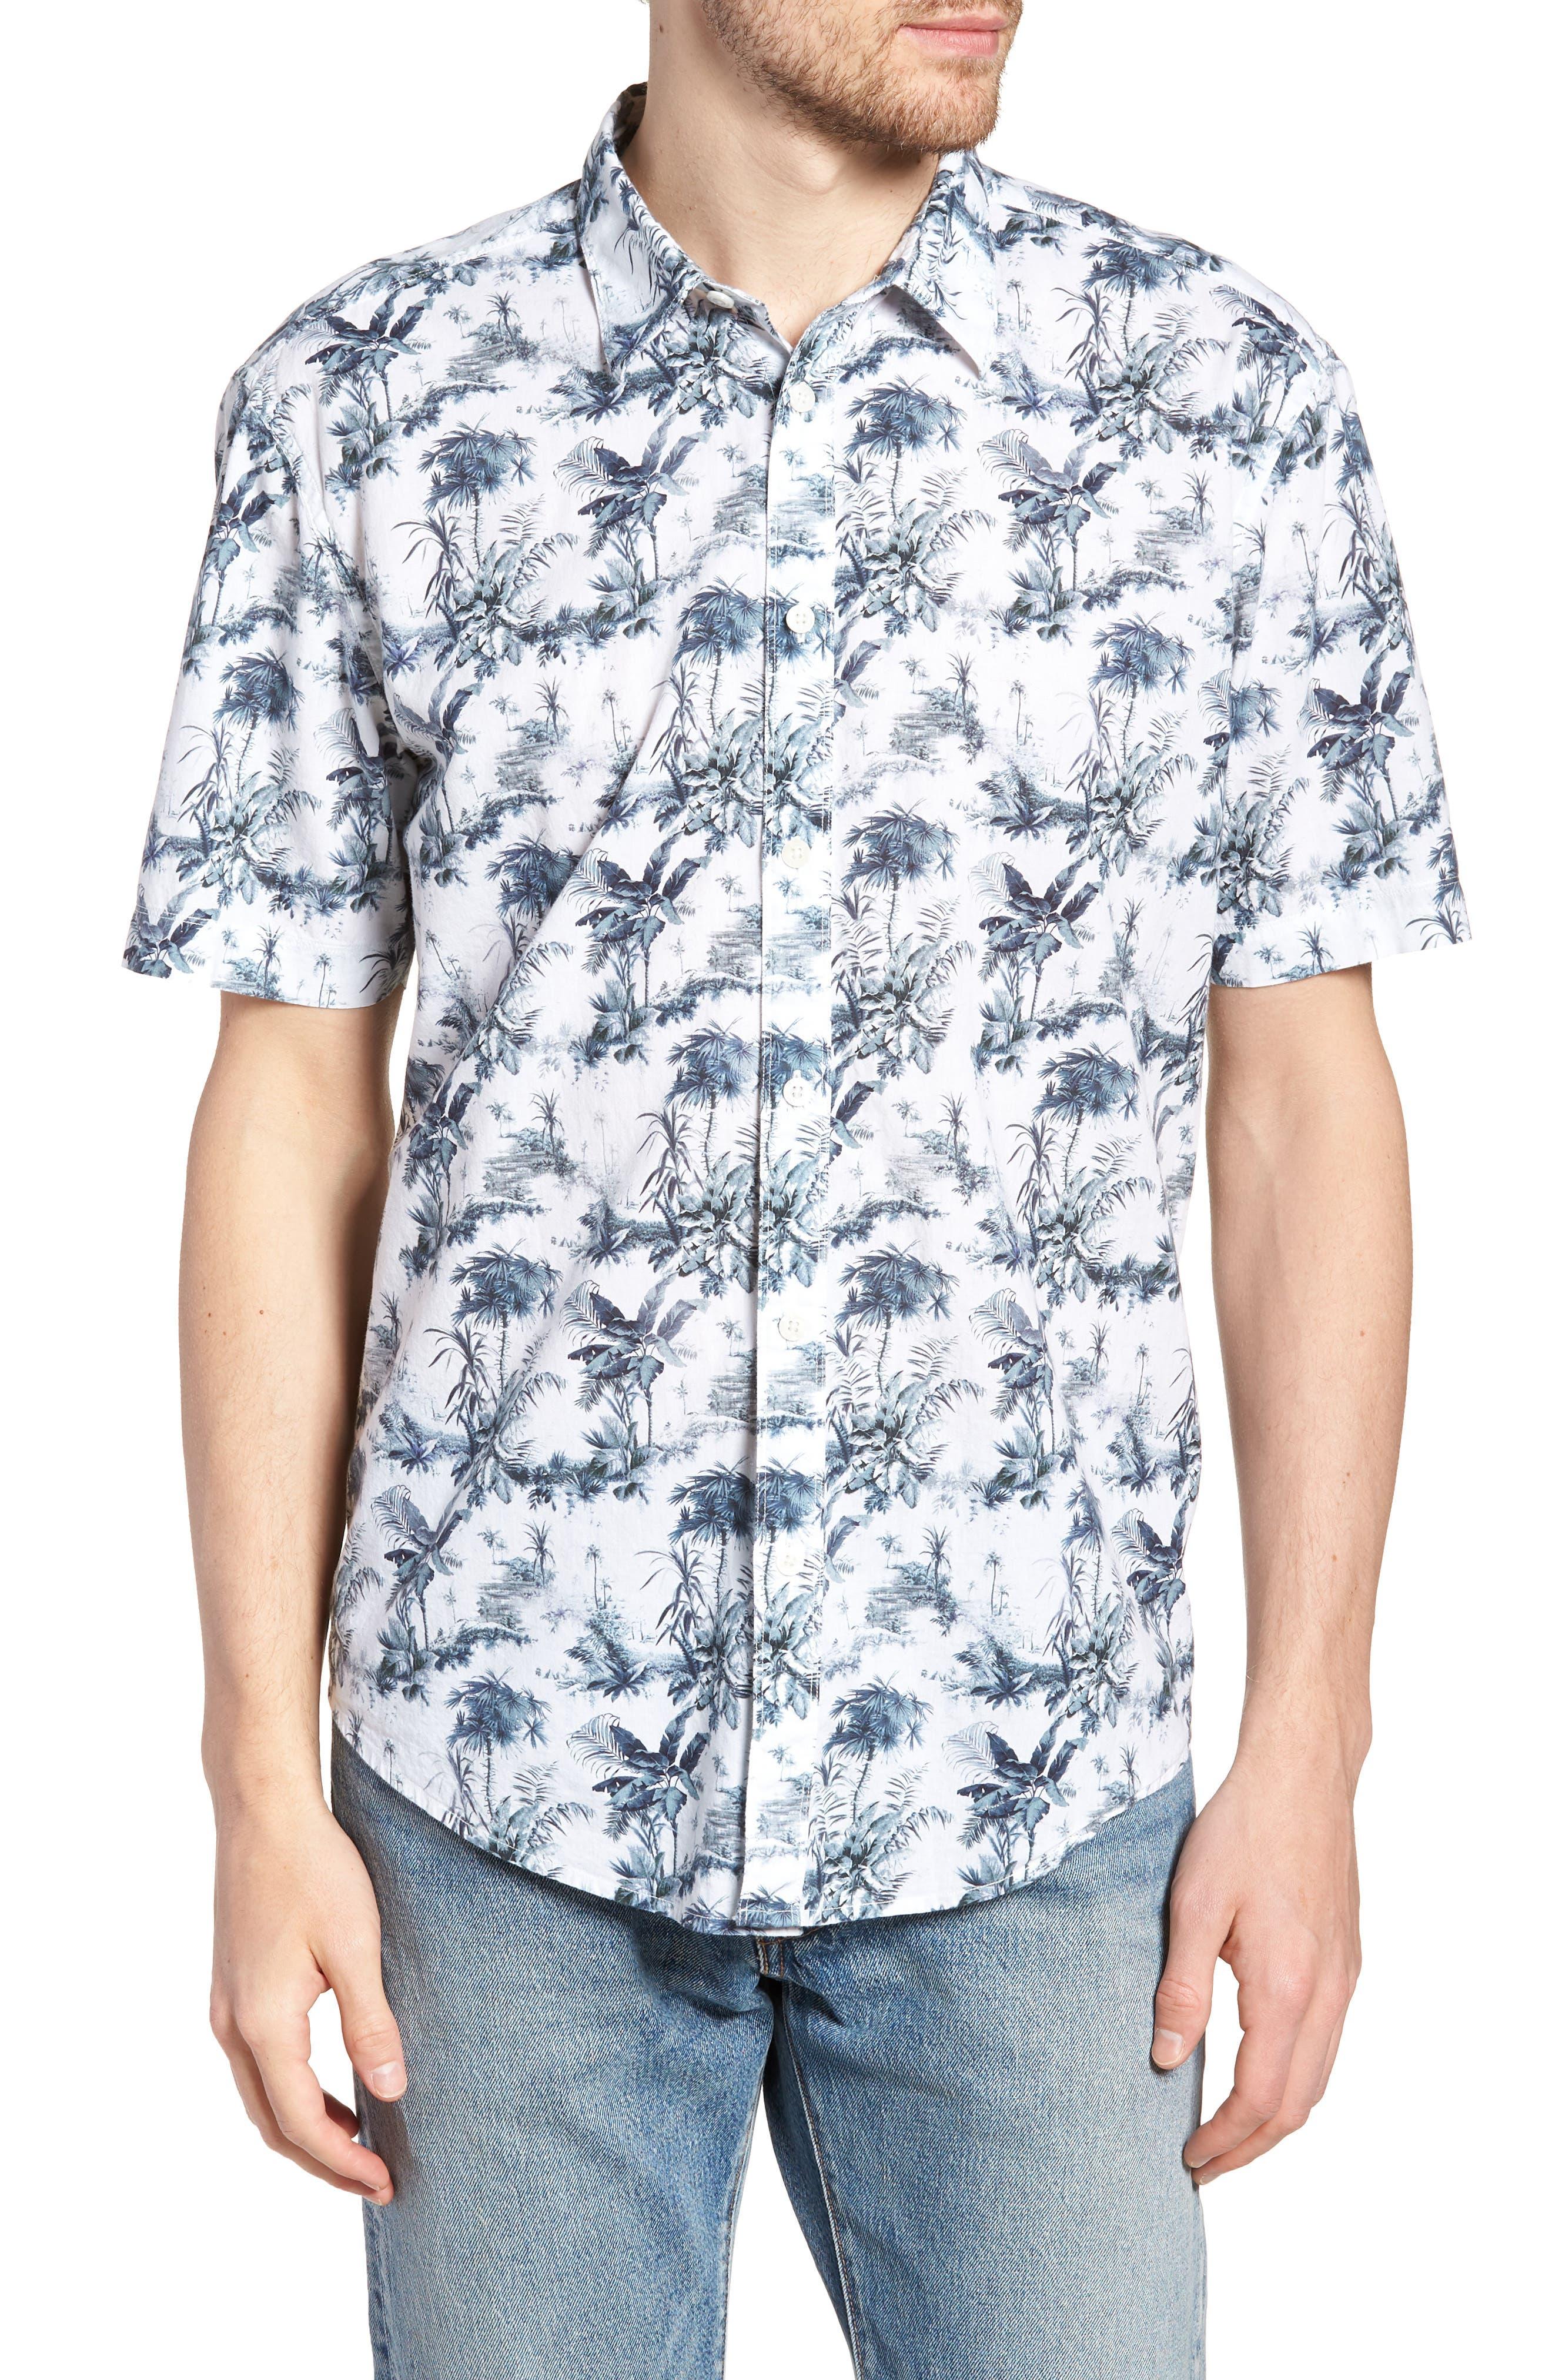 Waiki Regular Fit Short Sleeve Sport Shirt,                         Main,                         color, 100